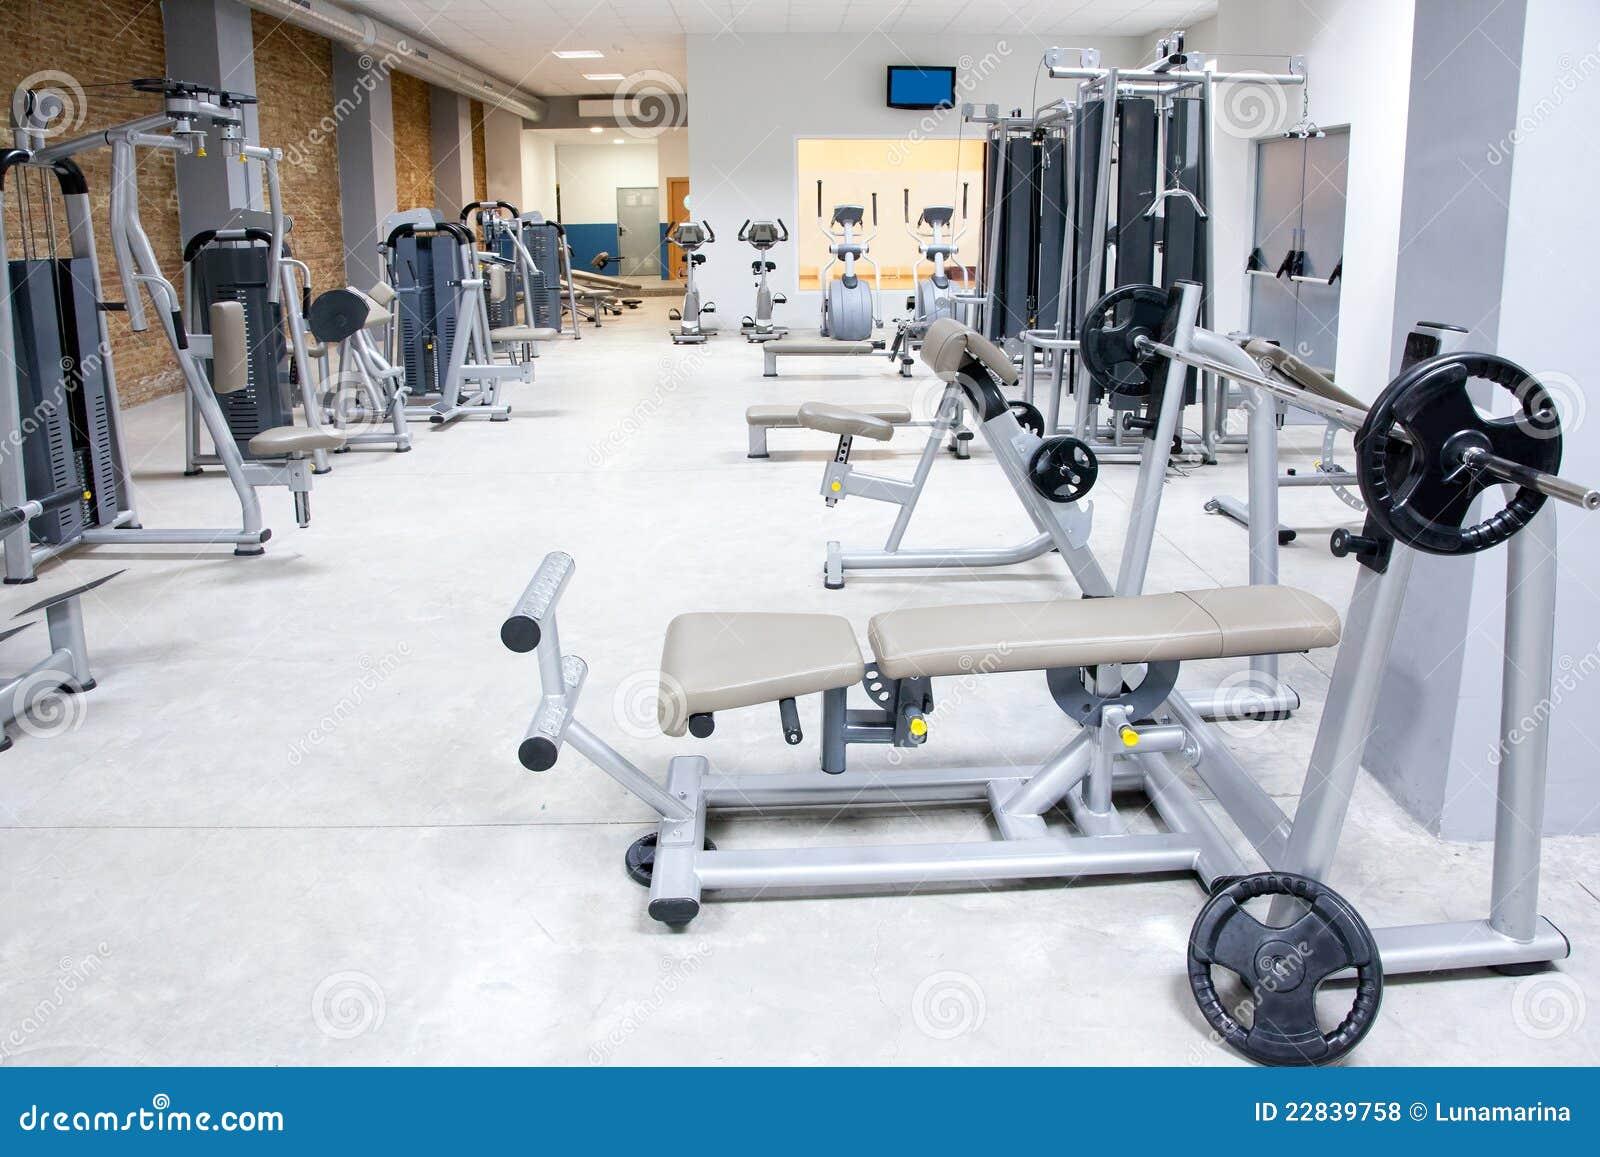 Fitness club gym with sport equipment interior royalty for Club gimnasio